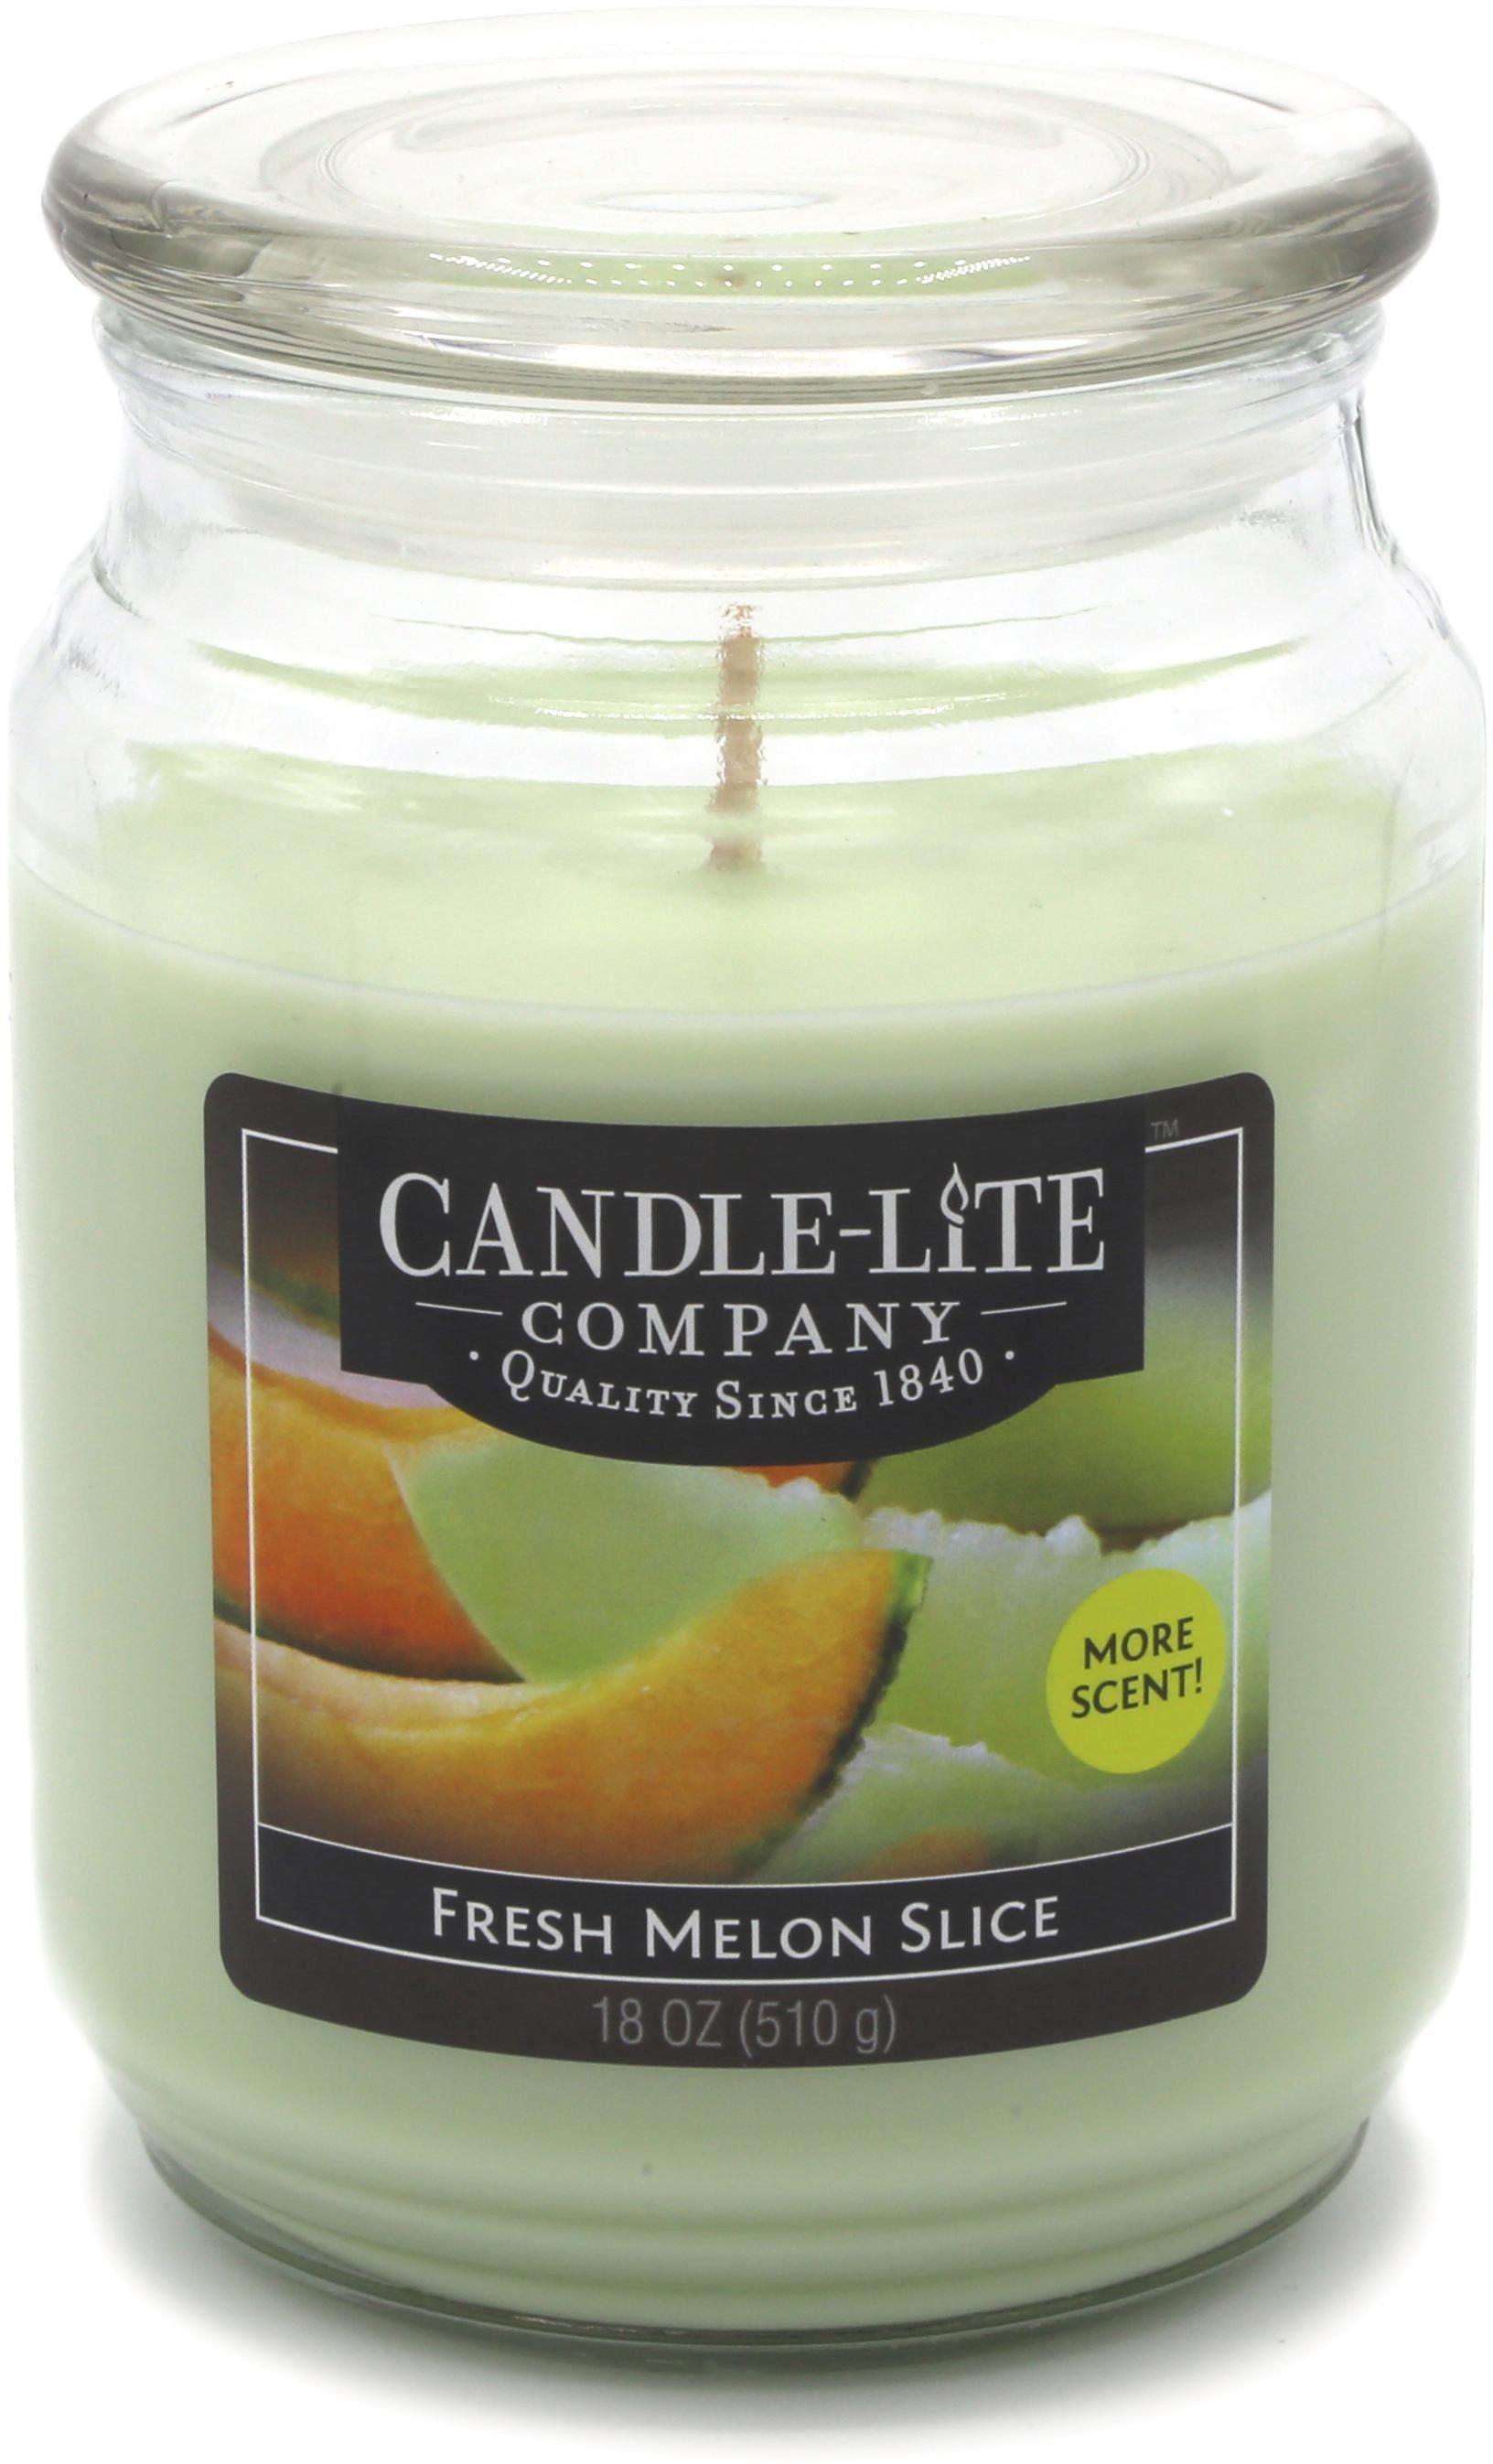 Candle-lite Duftkerze, 510g, »Everyday - Fresh Melon Slice«